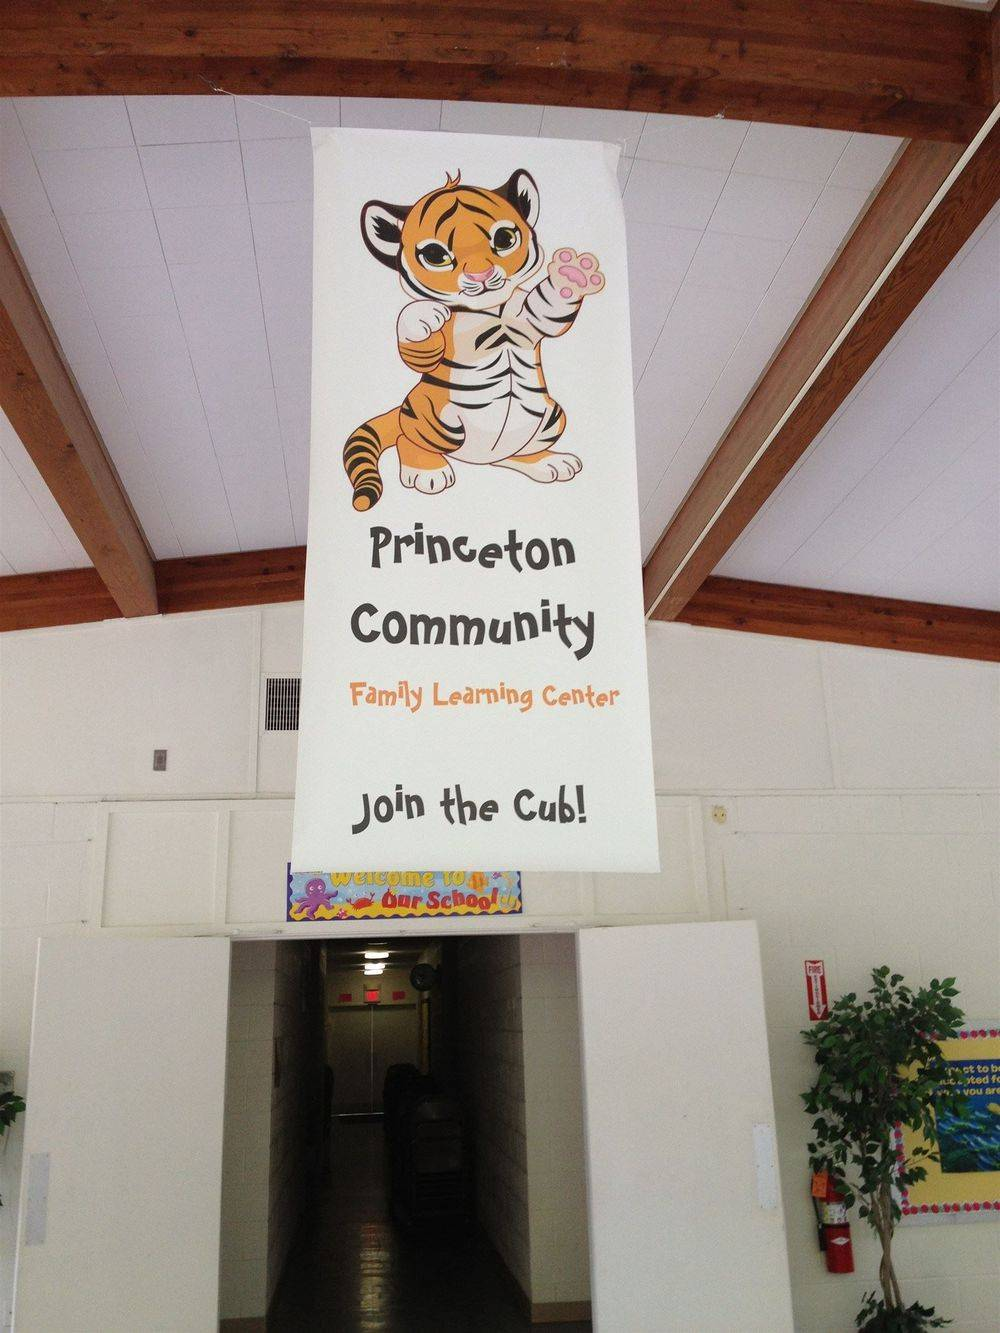 The Cub School's Rainbow Room